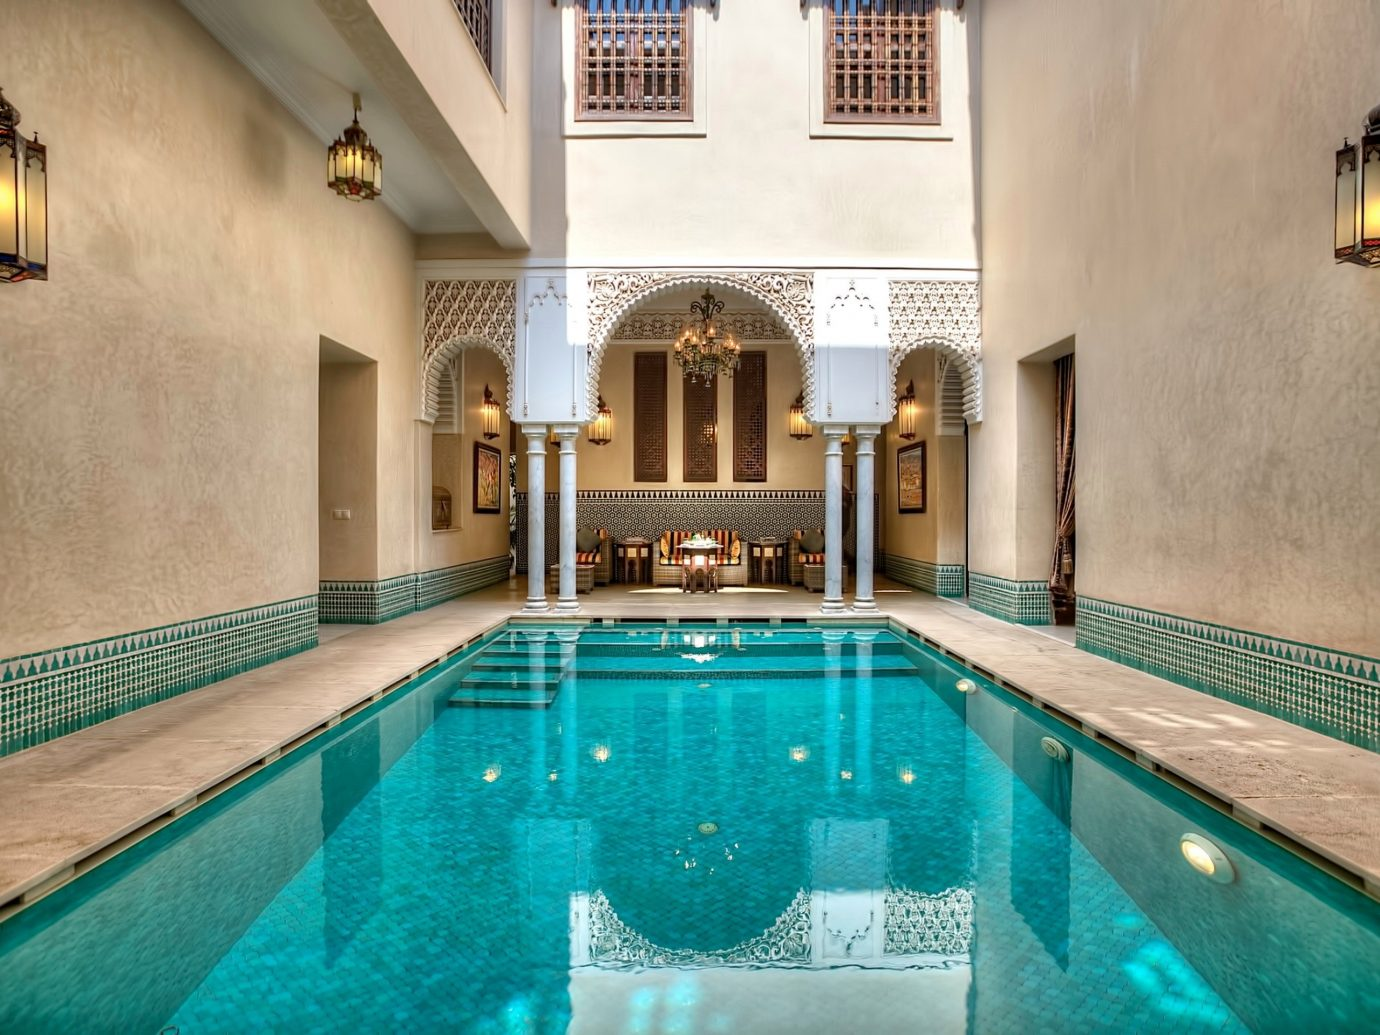 Hotels Trip Ideas swimming pool property indoor estate leisure mansion Villa